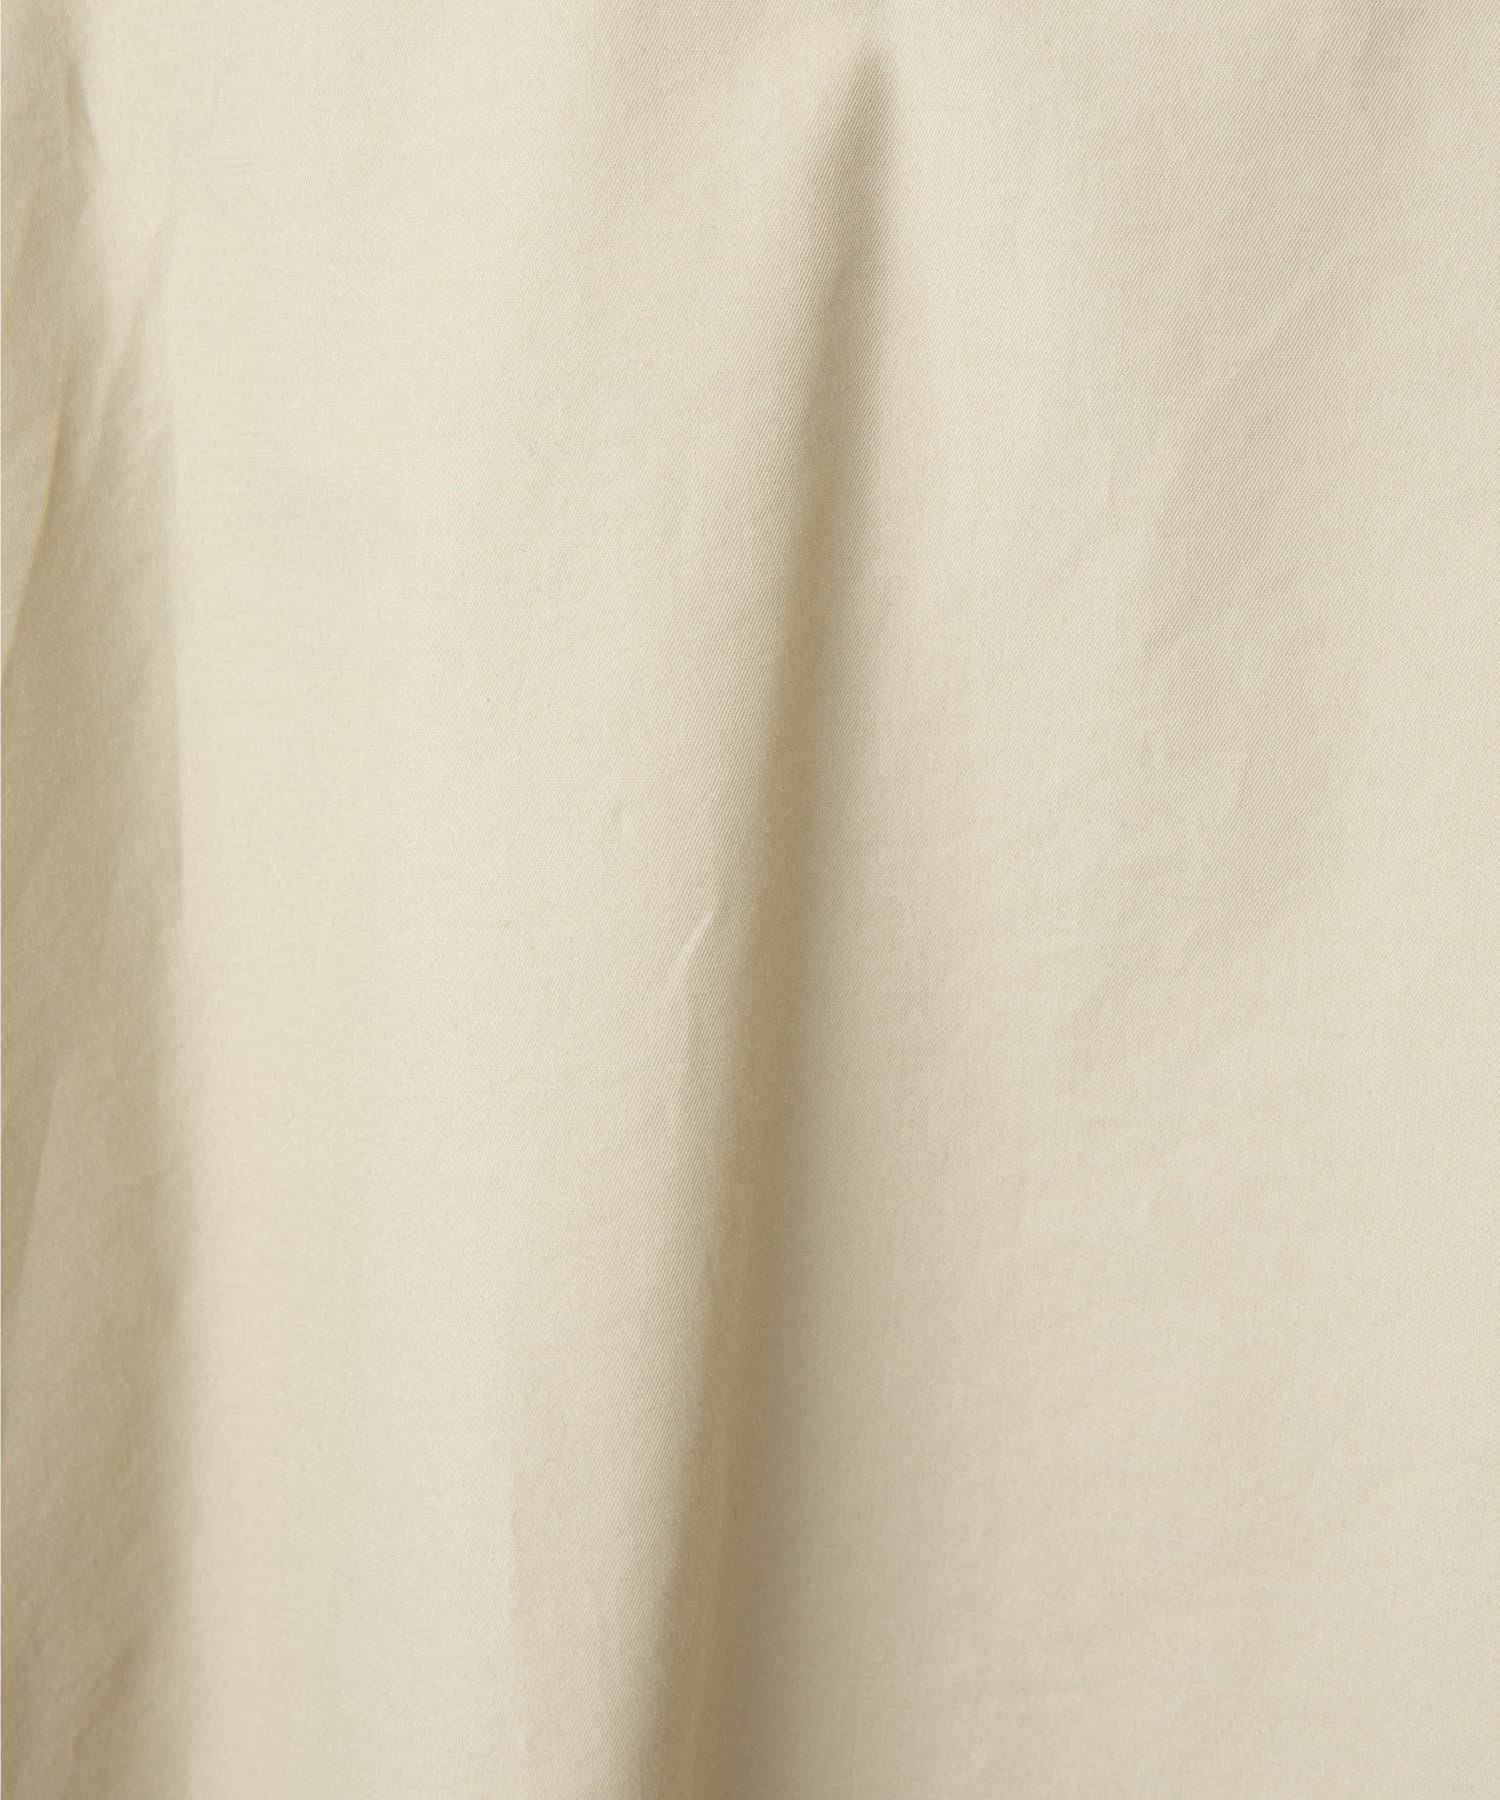 GALLARDAGALANTE(ガリャルダガランテ) 【HERITANOVUM】OLMETEX 2Wayトレンチコート